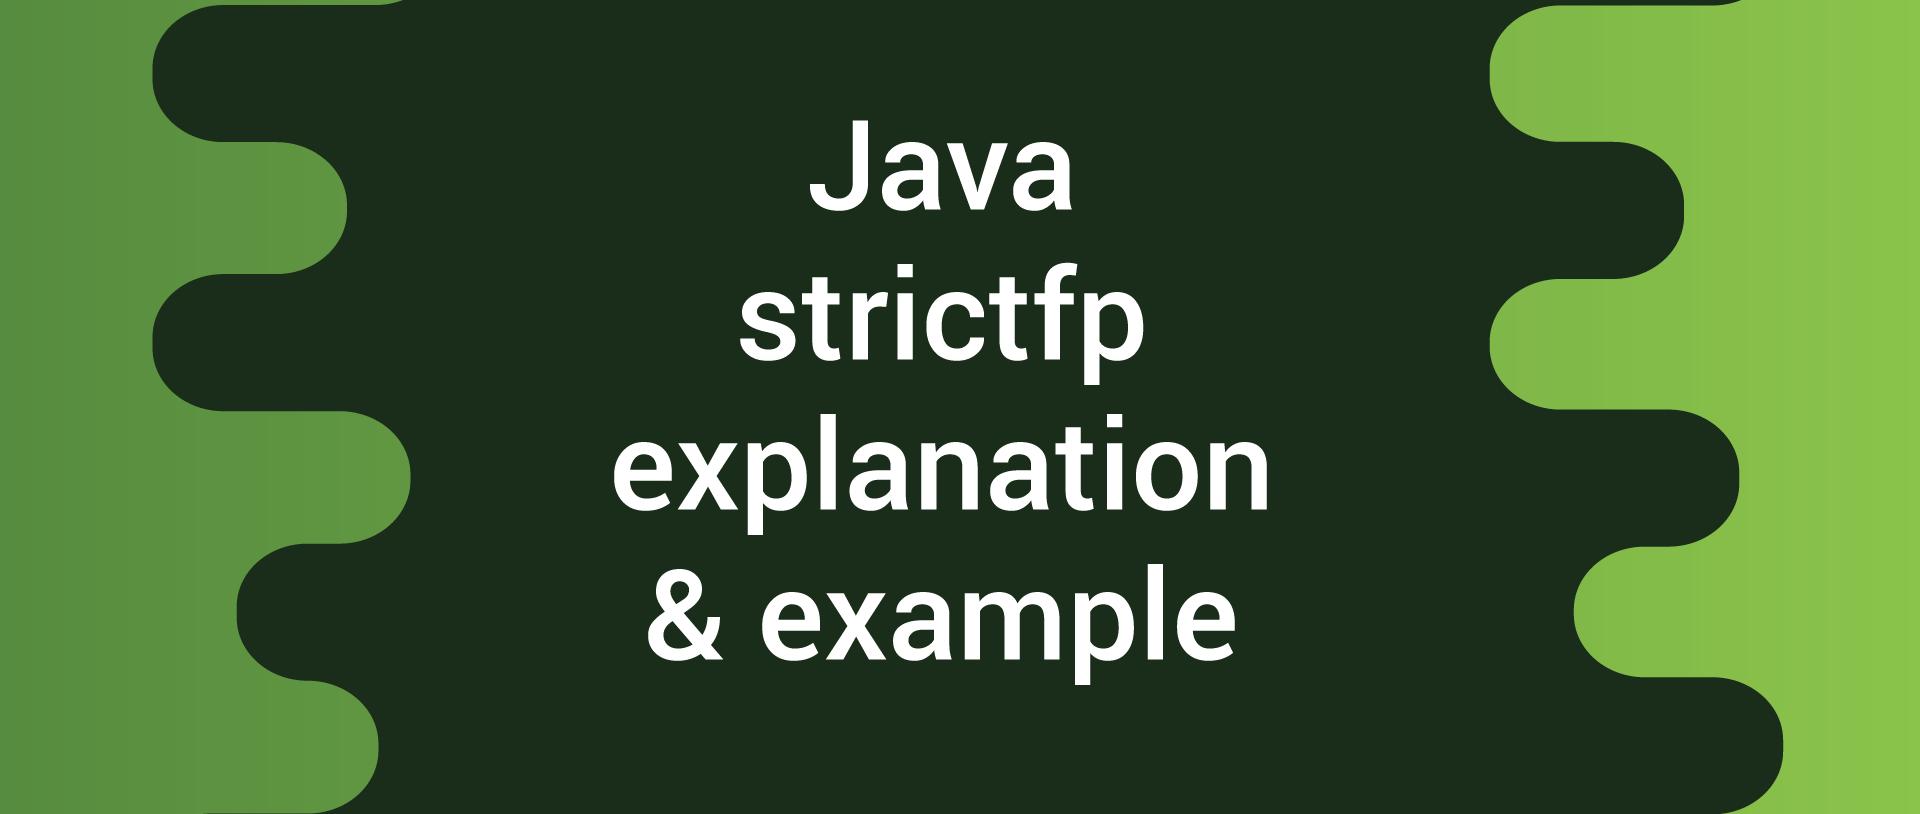 https://www.study24x7.com/article/200/java-strictfp-k...